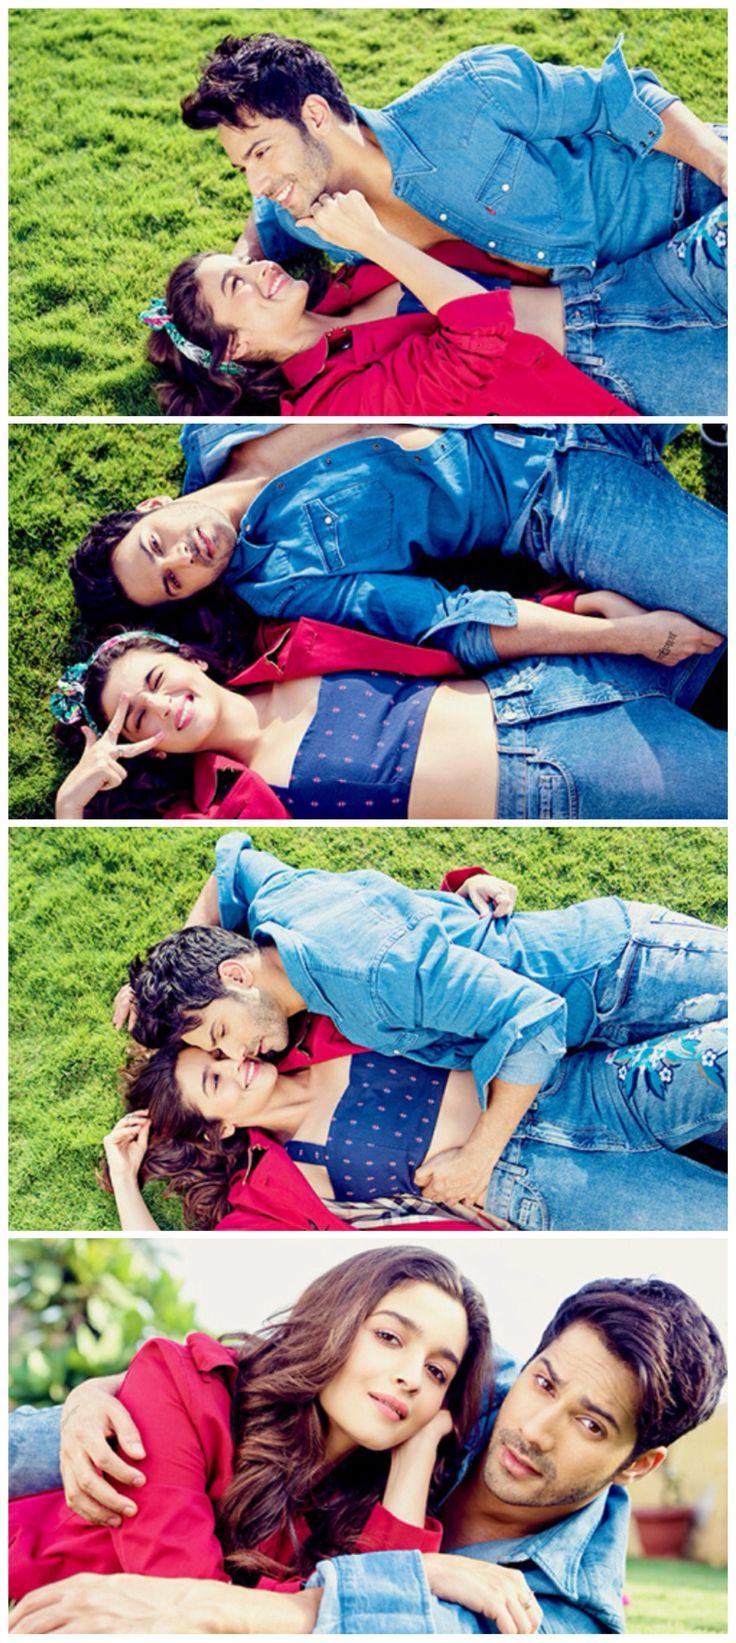 #Filmfareshoot #Varundhawan #Anjanajaisingh